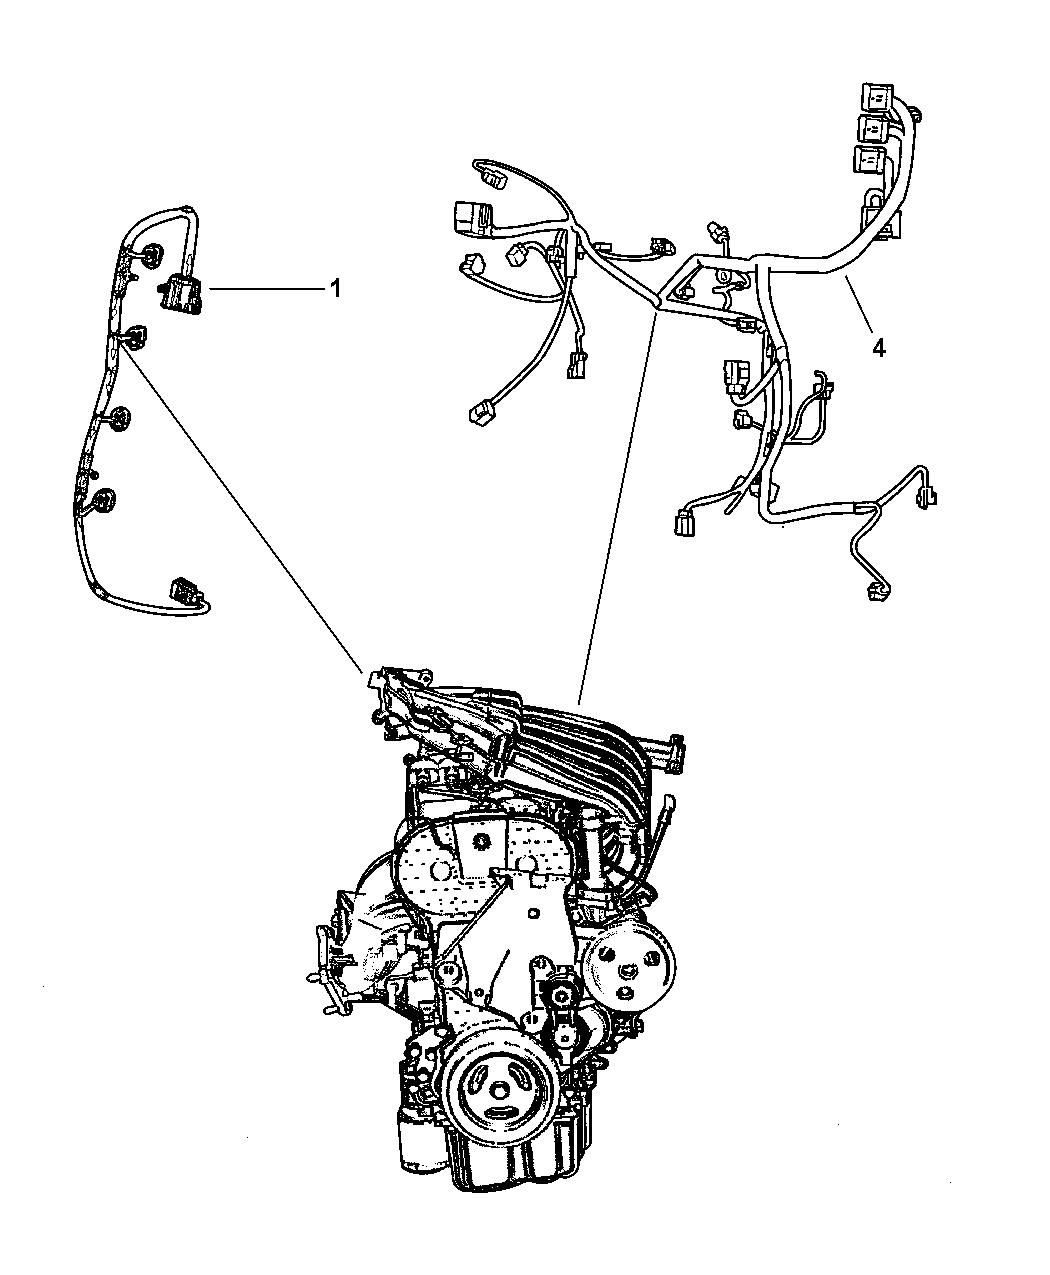 Chrysler Crossfire Wiring